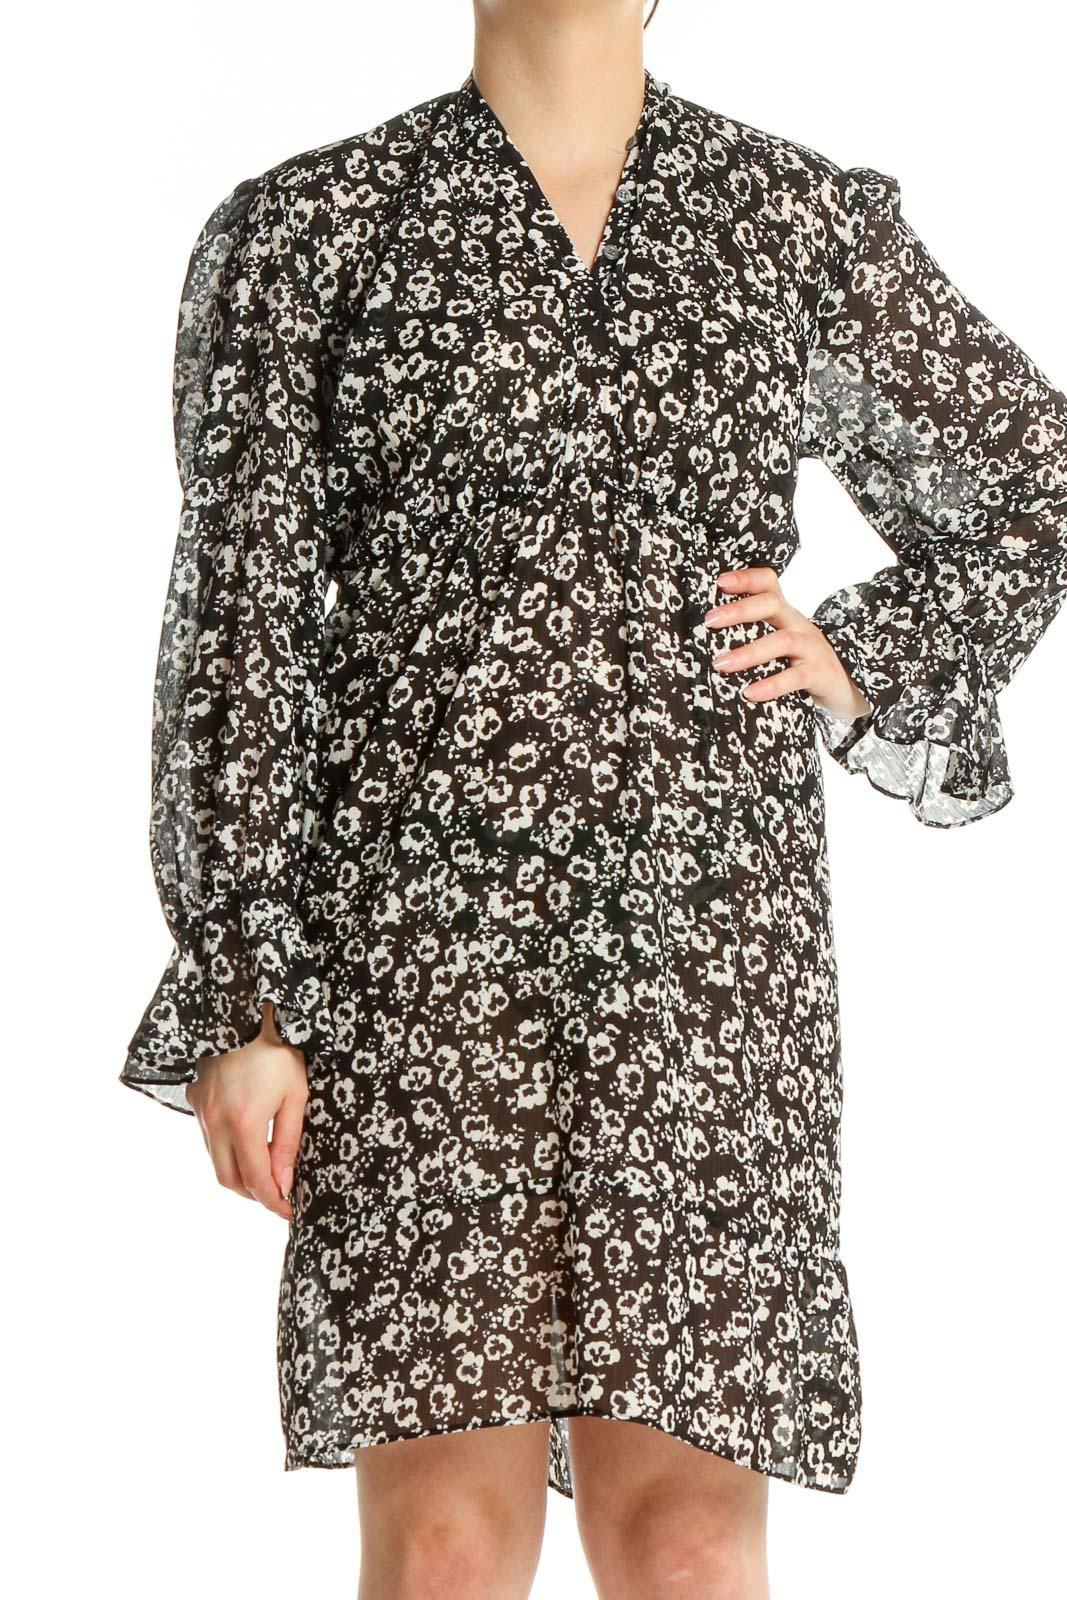 Black Day Floral Fit & Flare Dress Front